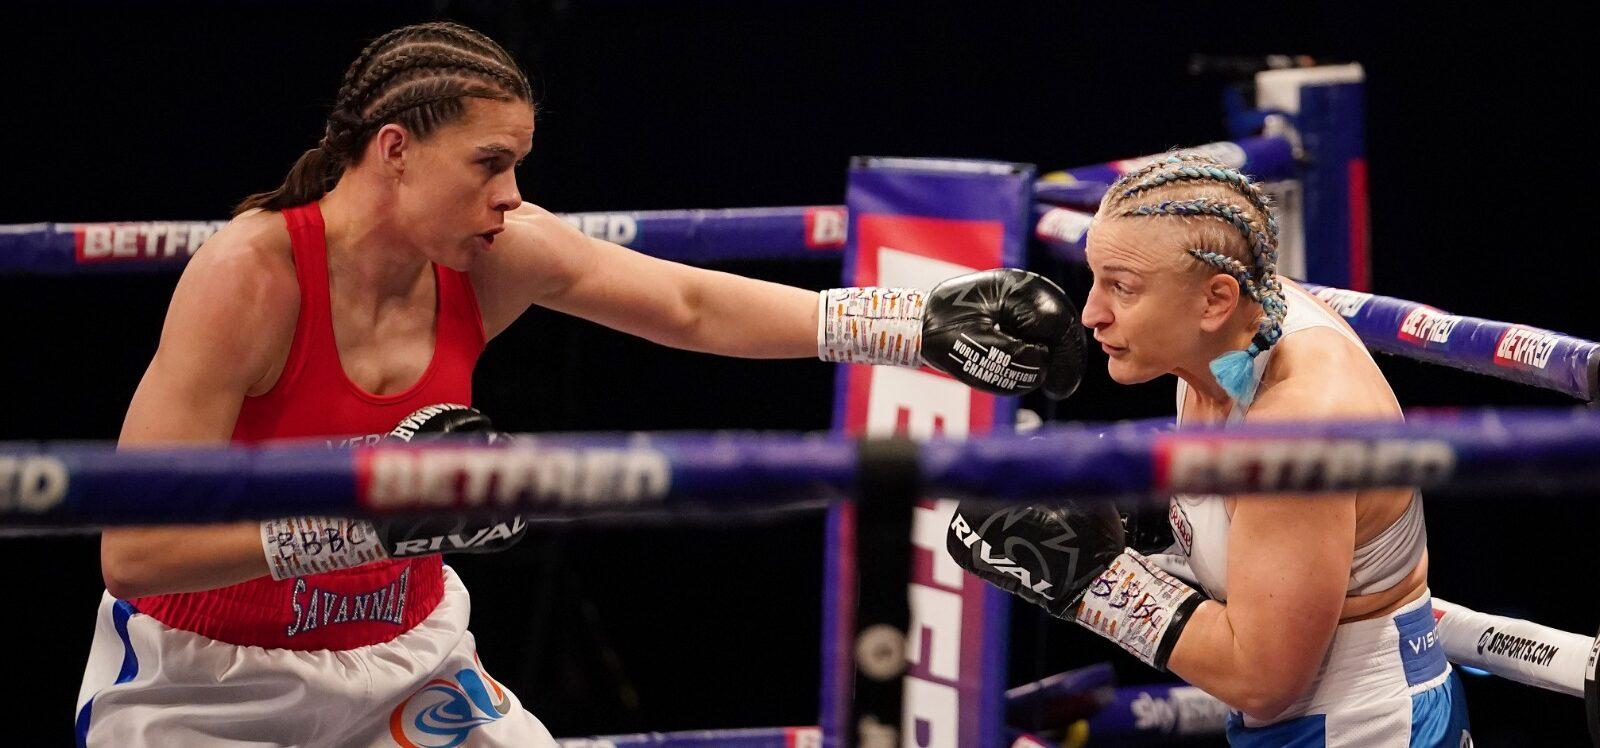 Savannah Marshall vs. Maria Lindberg | Boxen247.com